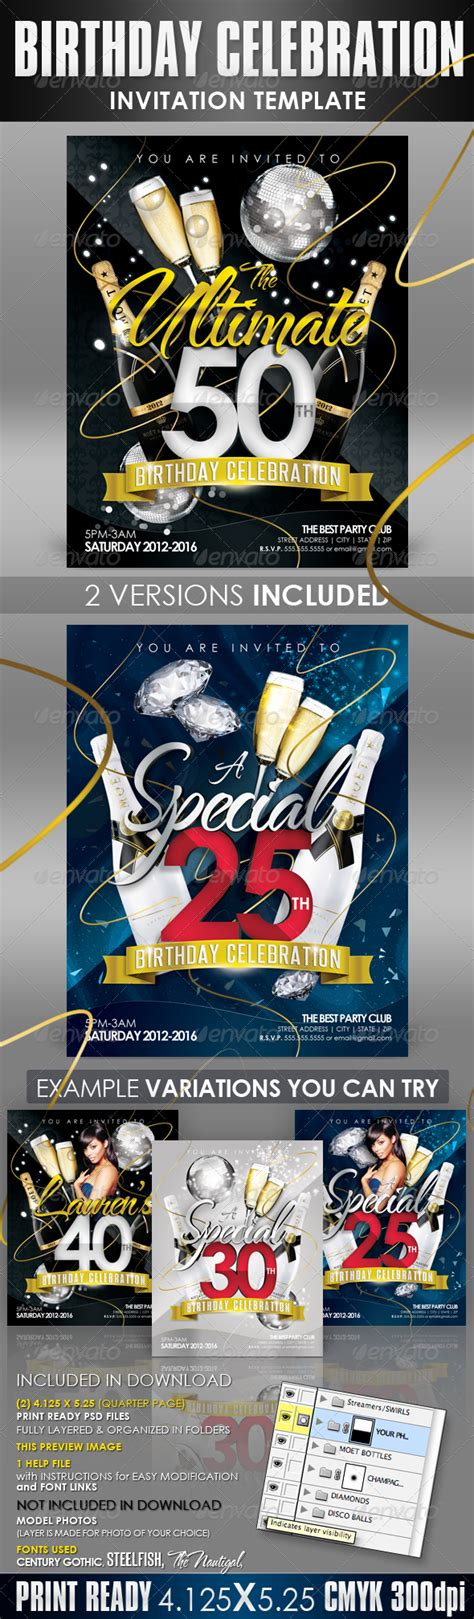 Birthday Invitation Templates Club Flyer Style By Creativb Graphicriver Club Wedd Invitation Templates